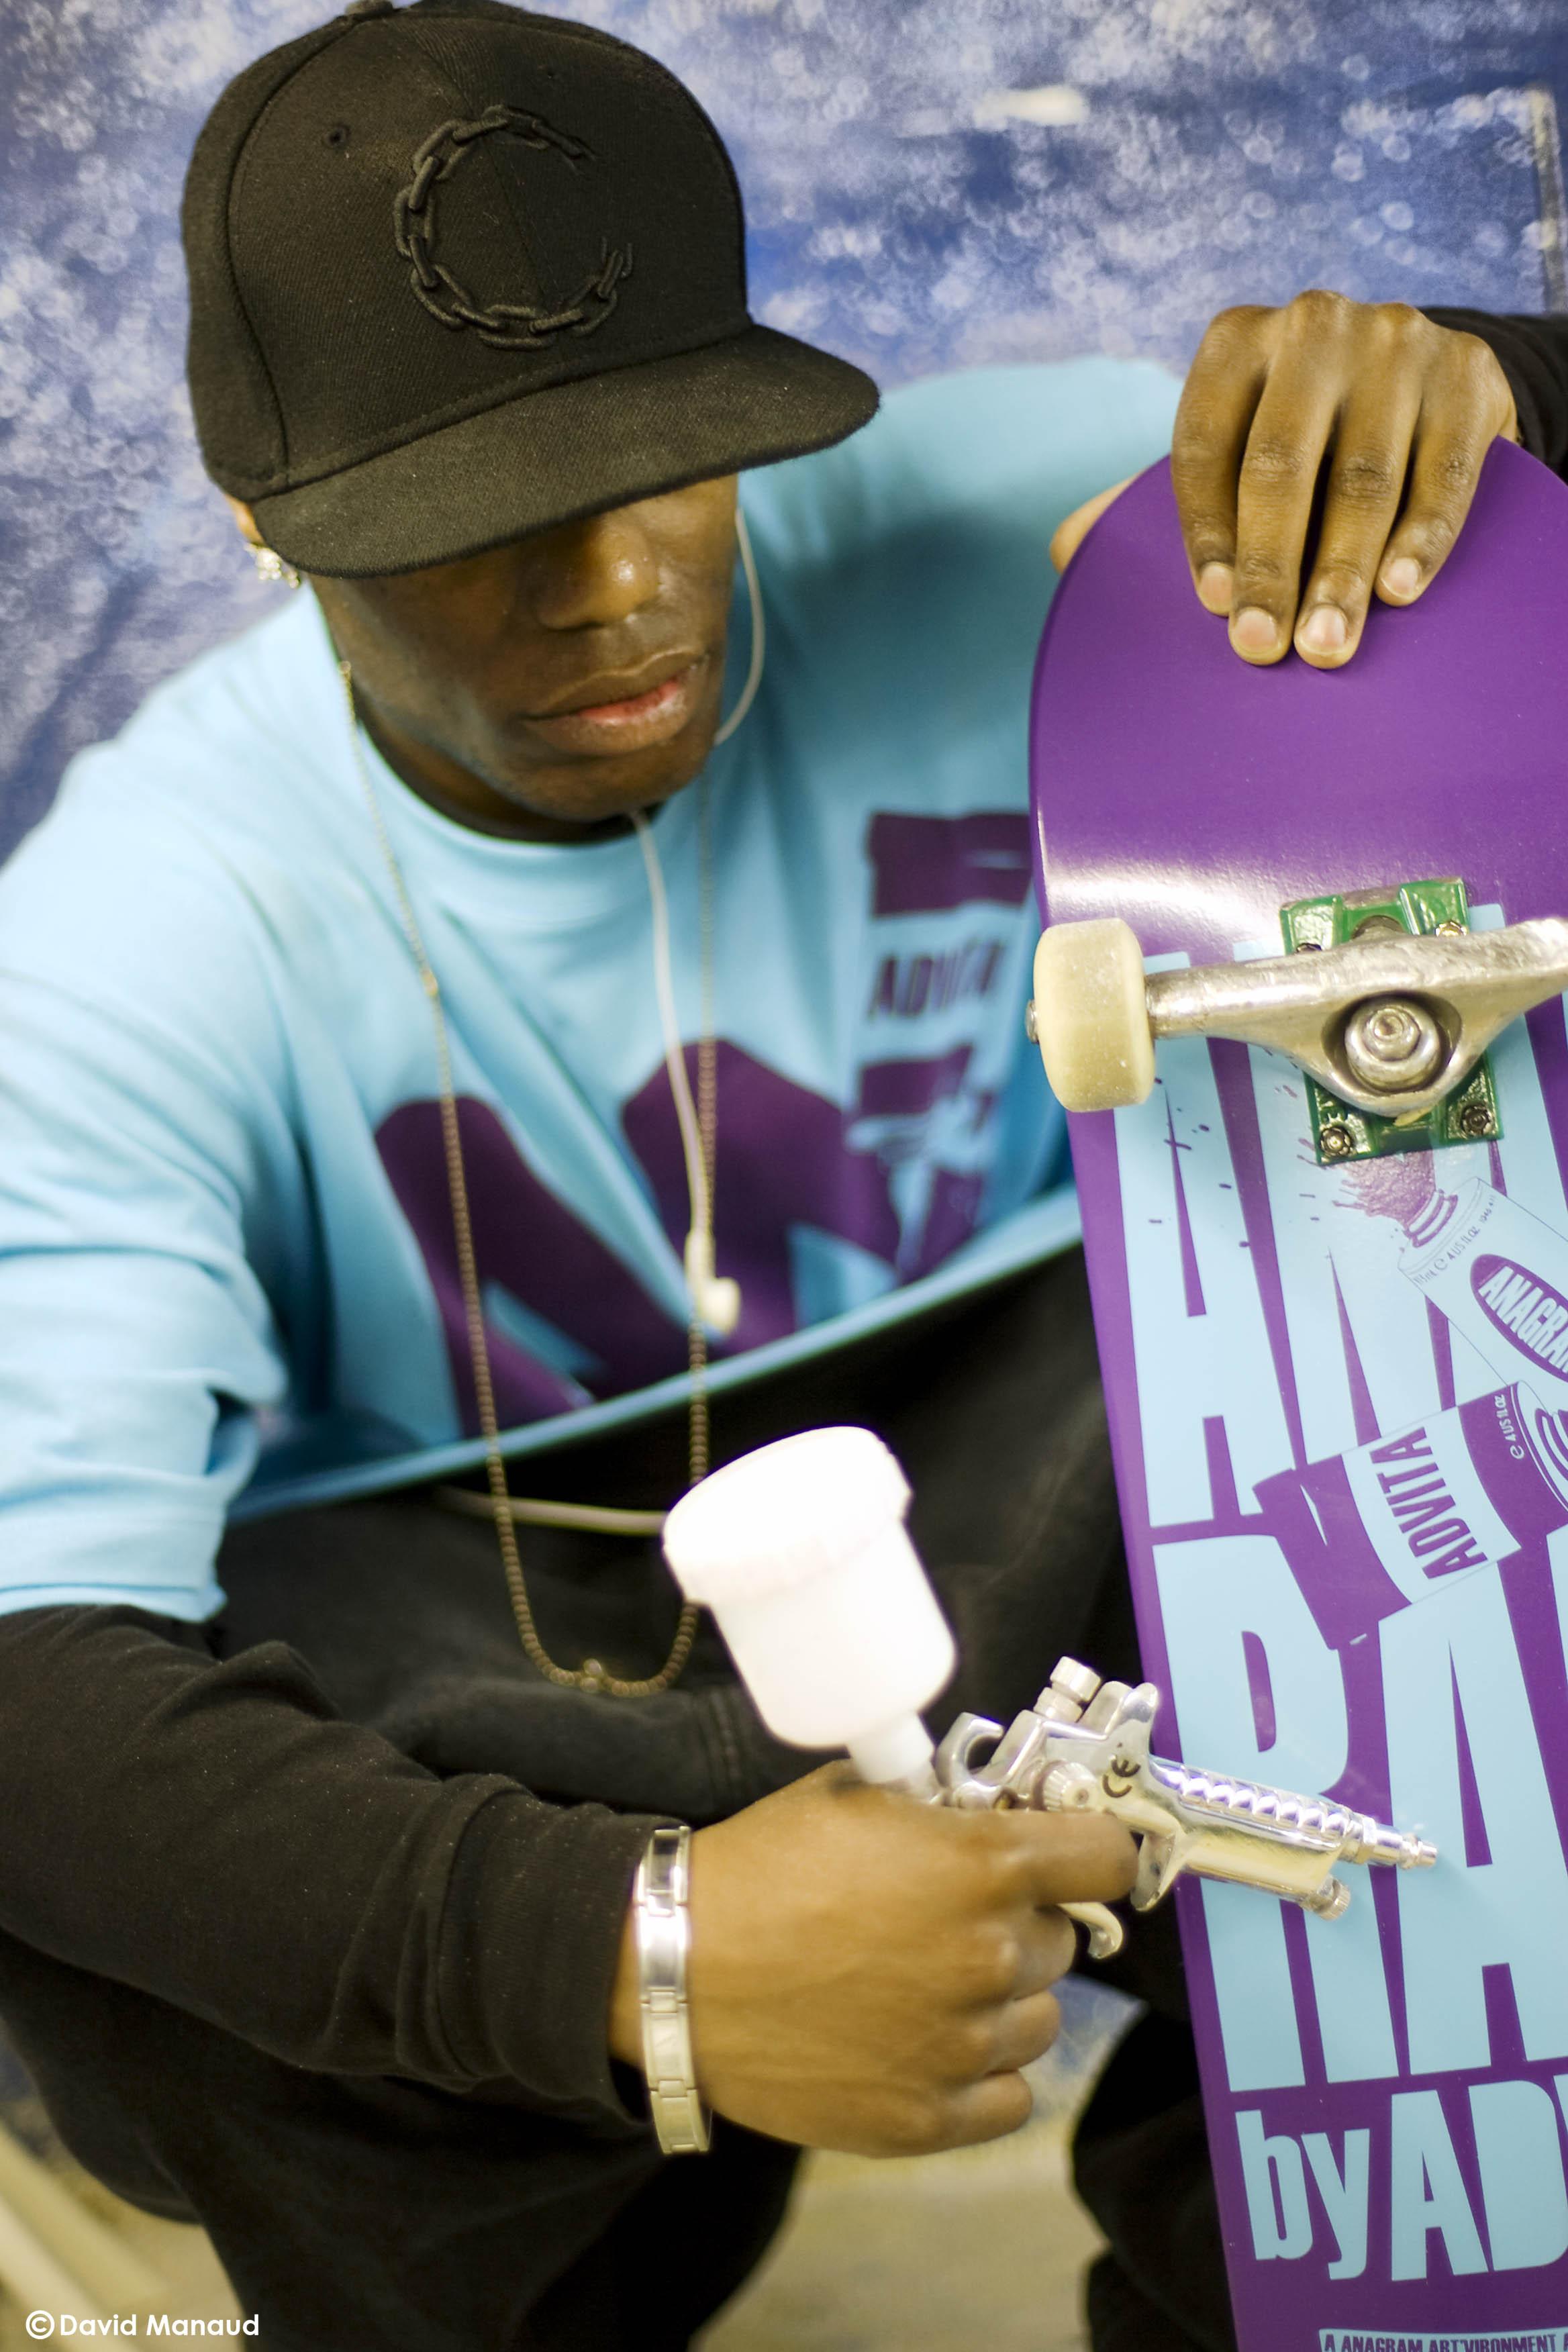 Anagram Skateboards x Advita / @ David Manaud